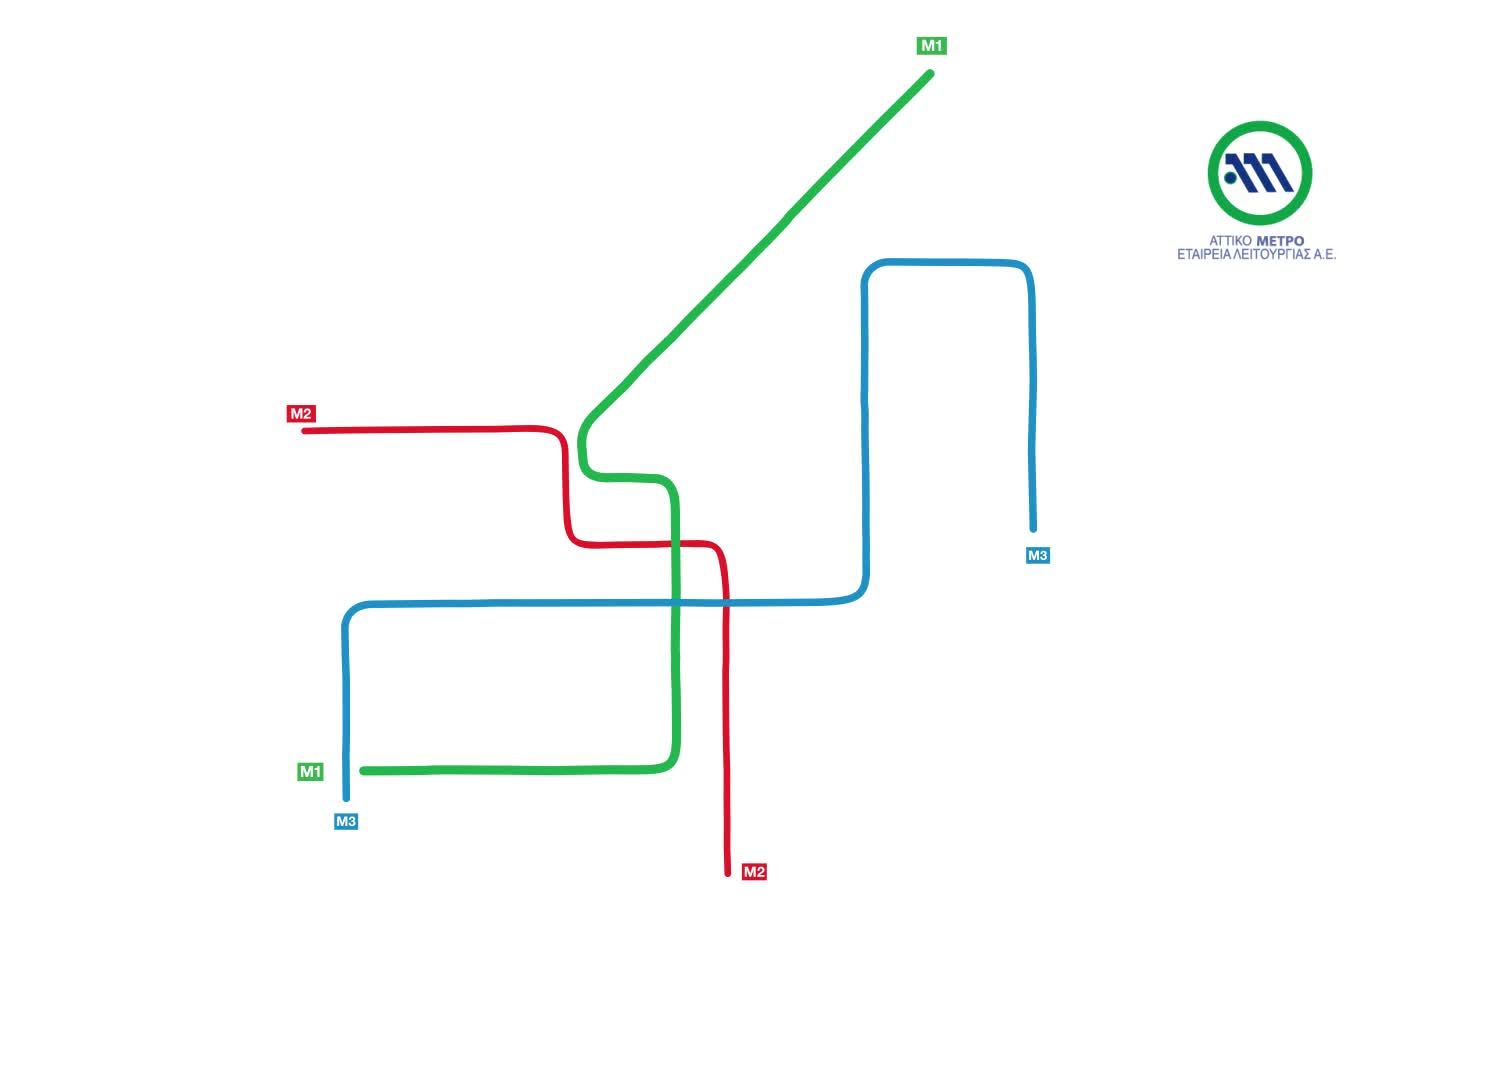 athens, dataisbeautiful, Athens Metro Map vs Actual Geography GIFs